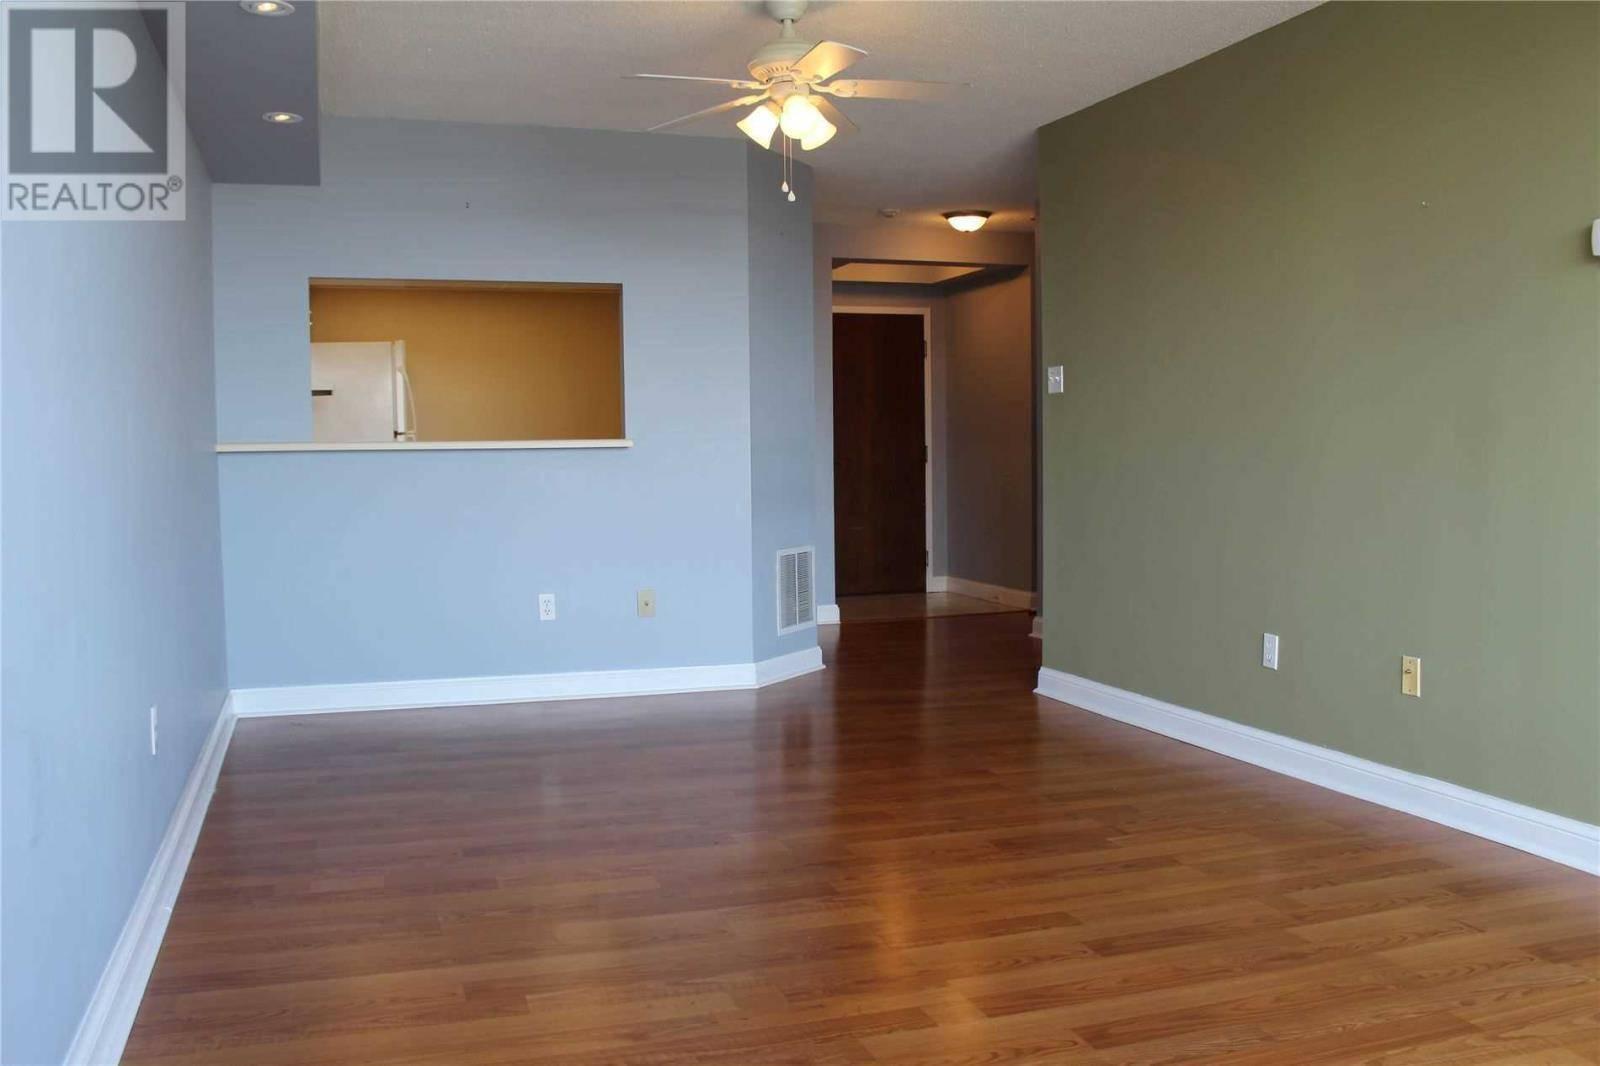 Condo for sale at 24 Hanover Rd South Unit 1208 Brampton Ontario - MLS: W4548669